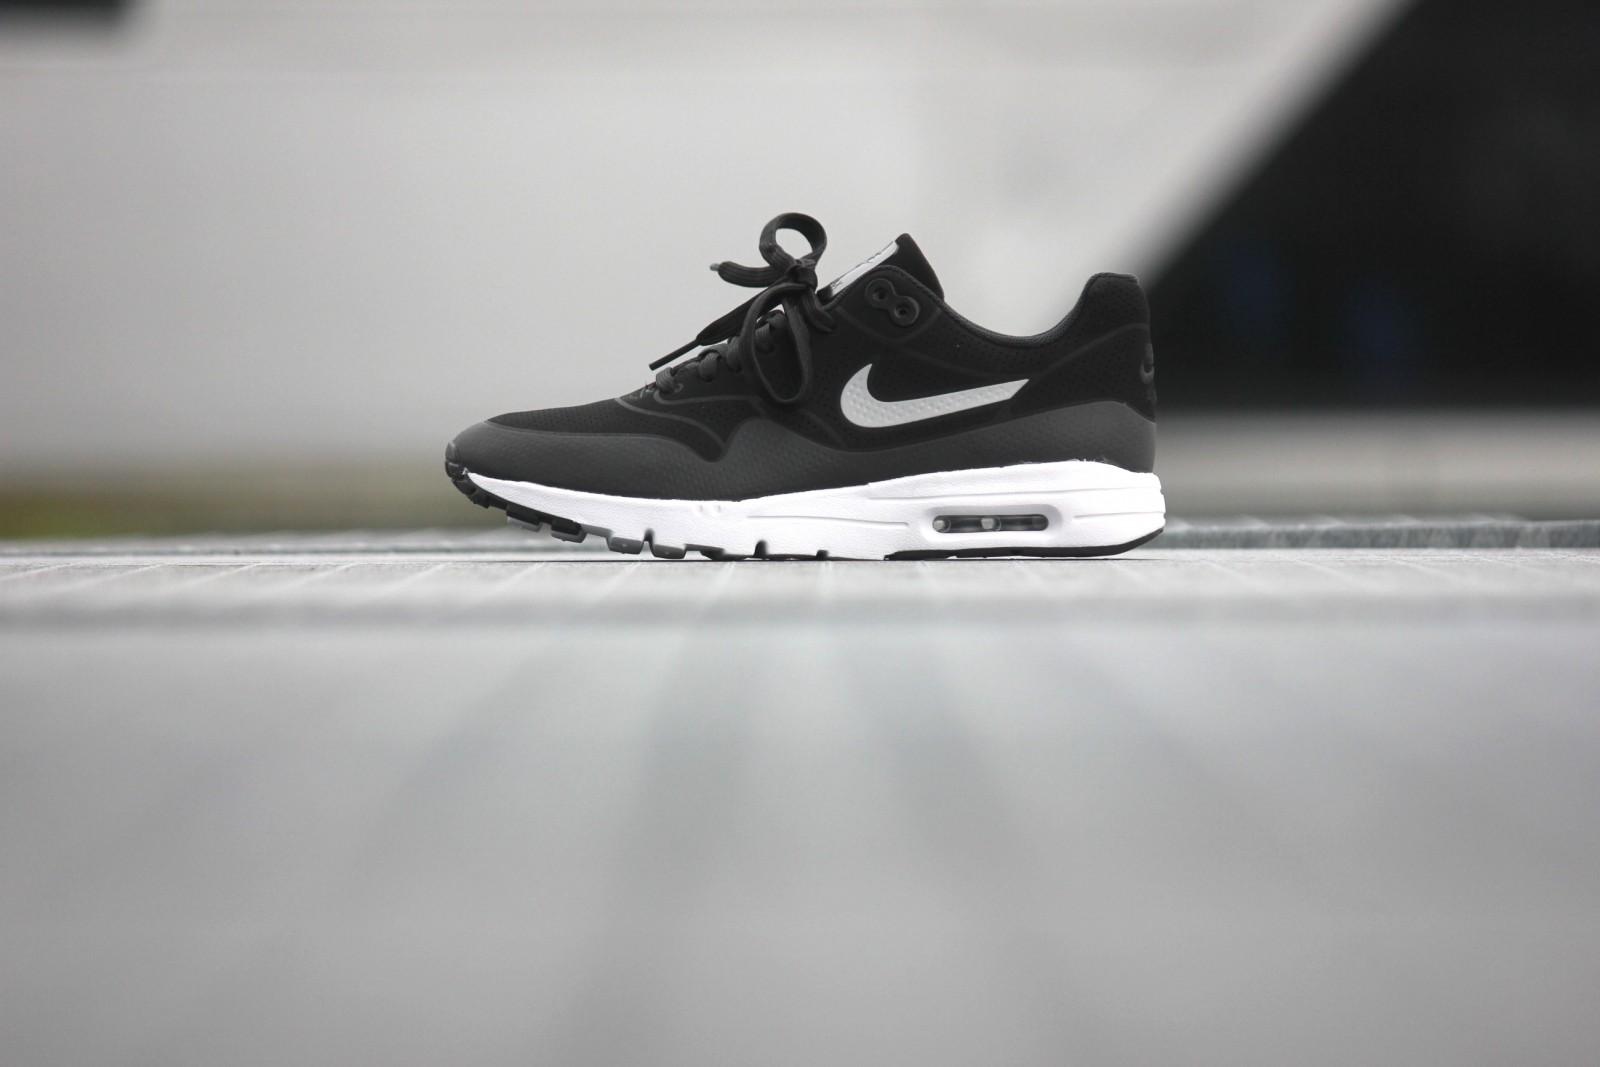 Nike Wmns Air Max 1 Ultra Moire Black Black Metallic Silver White 704995 001